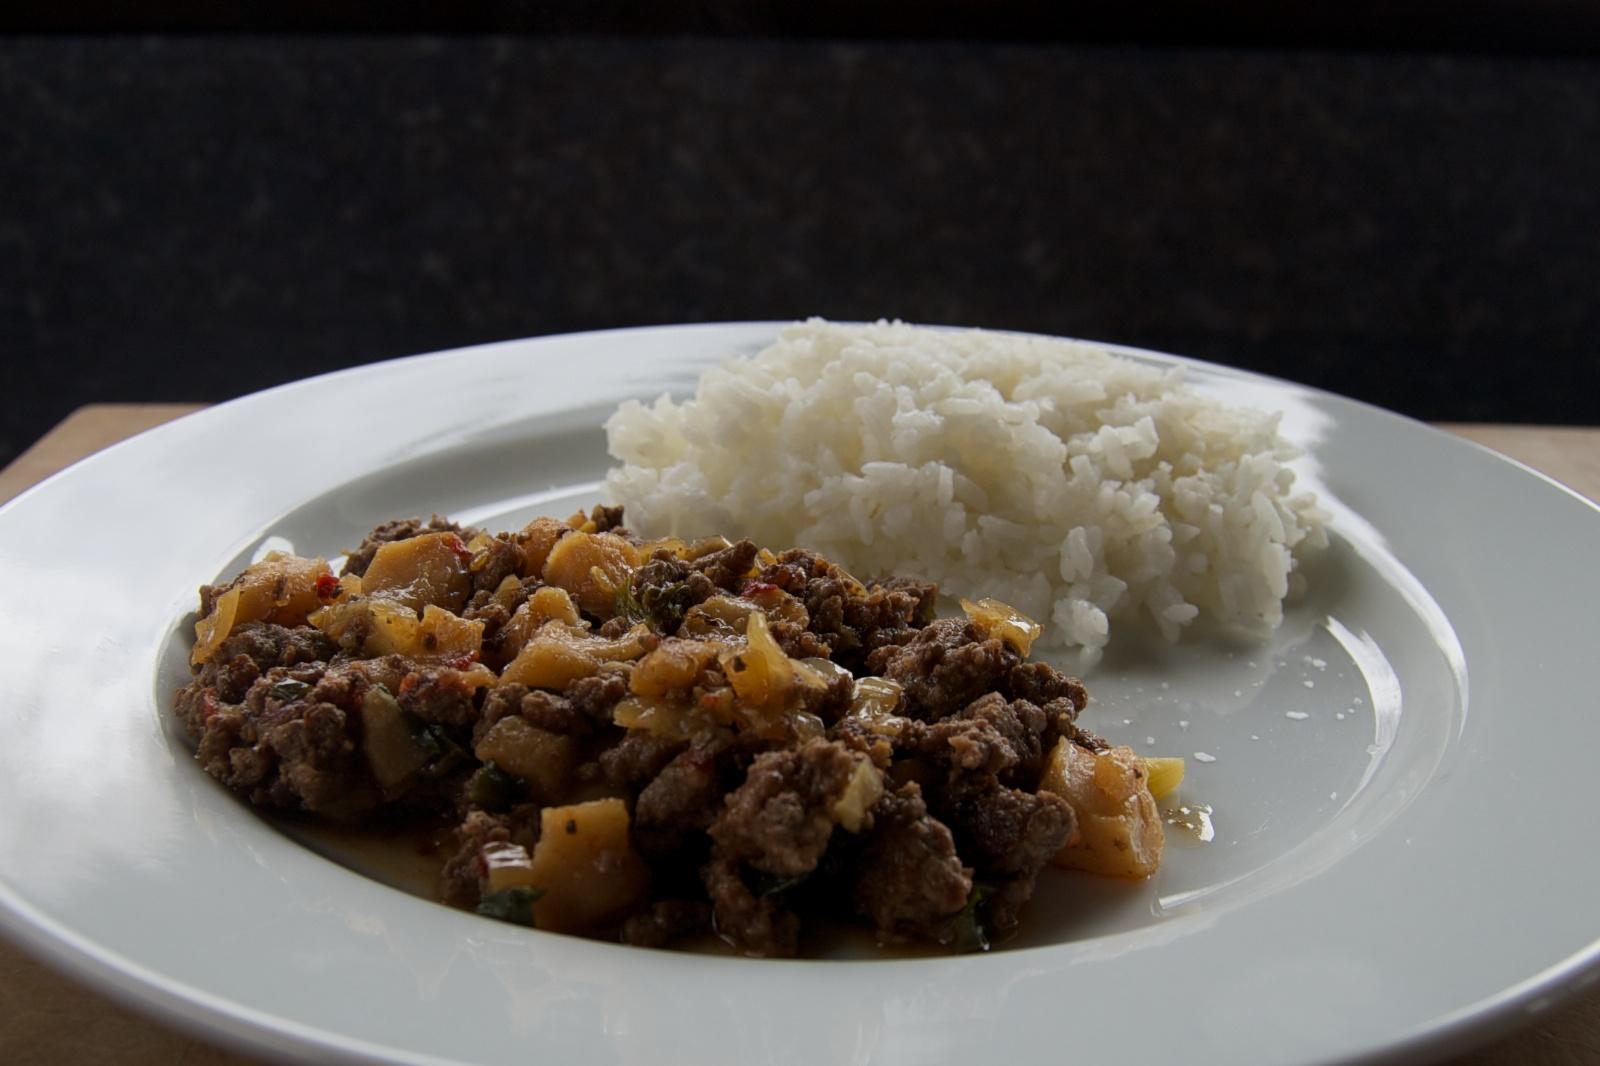 http://blog.rickk.com/food/2013/04/14/ate.2013.04.14.l.jpg